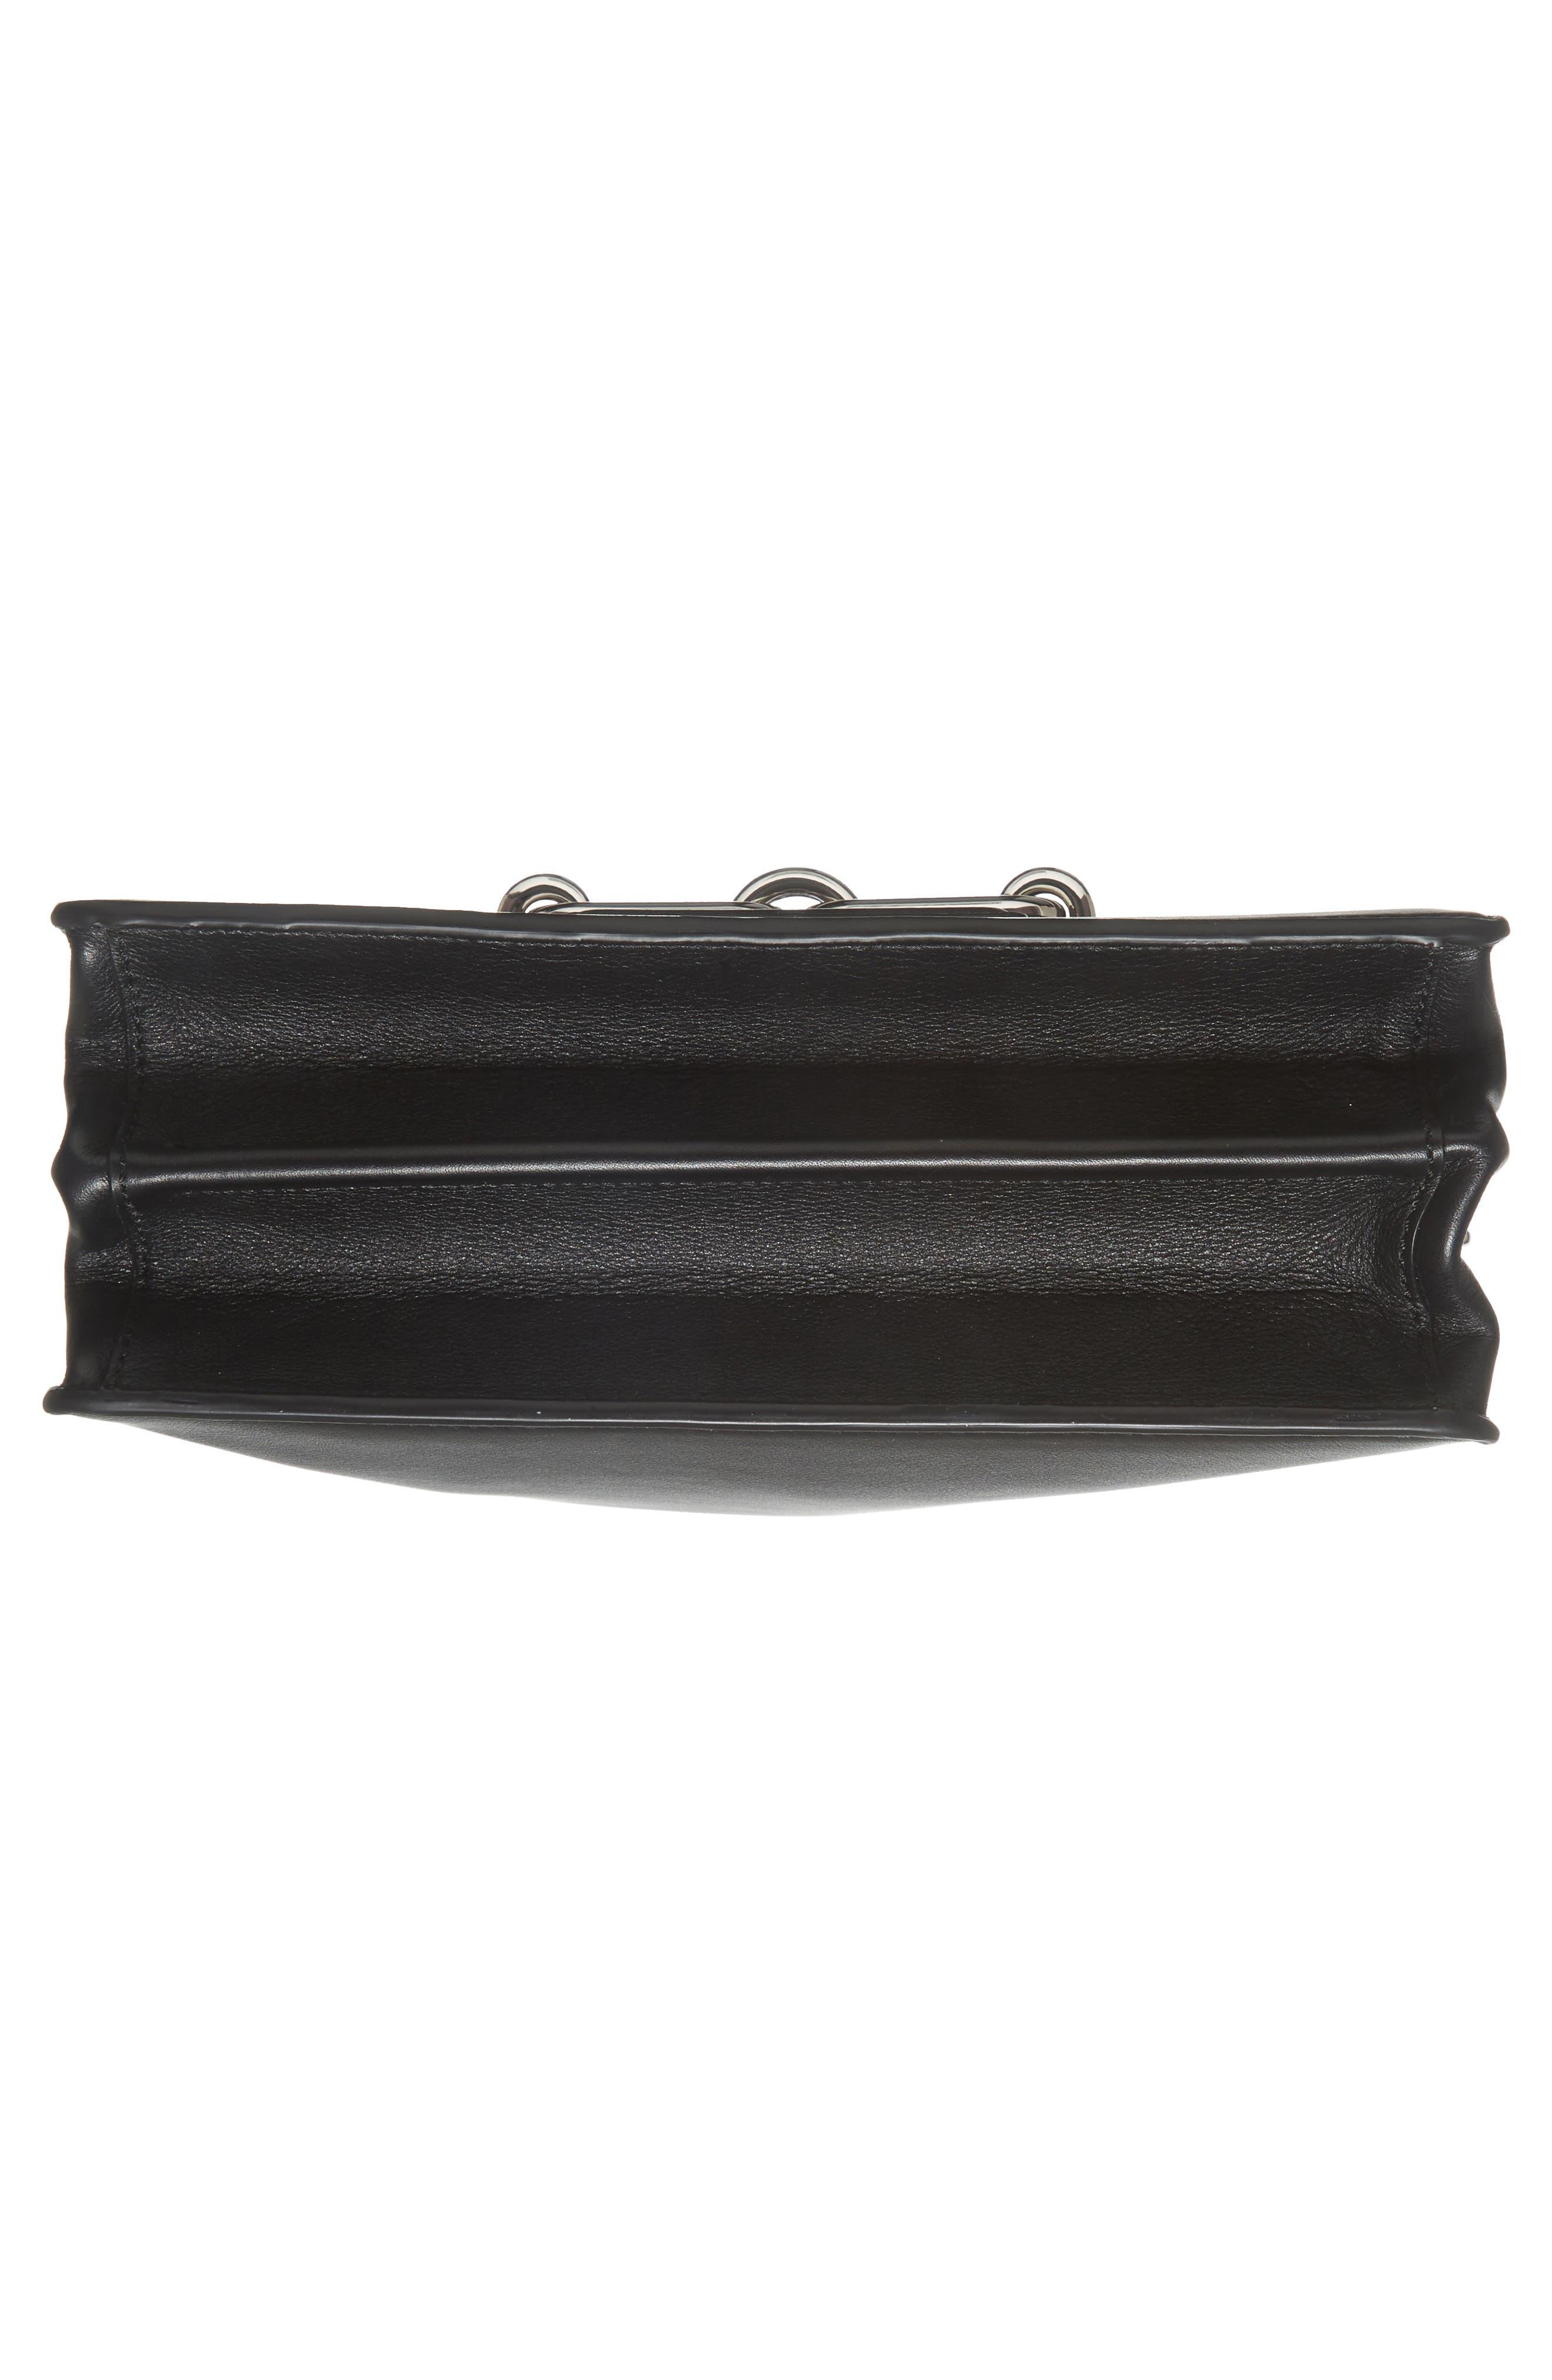 Medium Shoulder Bag,                             Alternate thumbnail 6, color,                             001